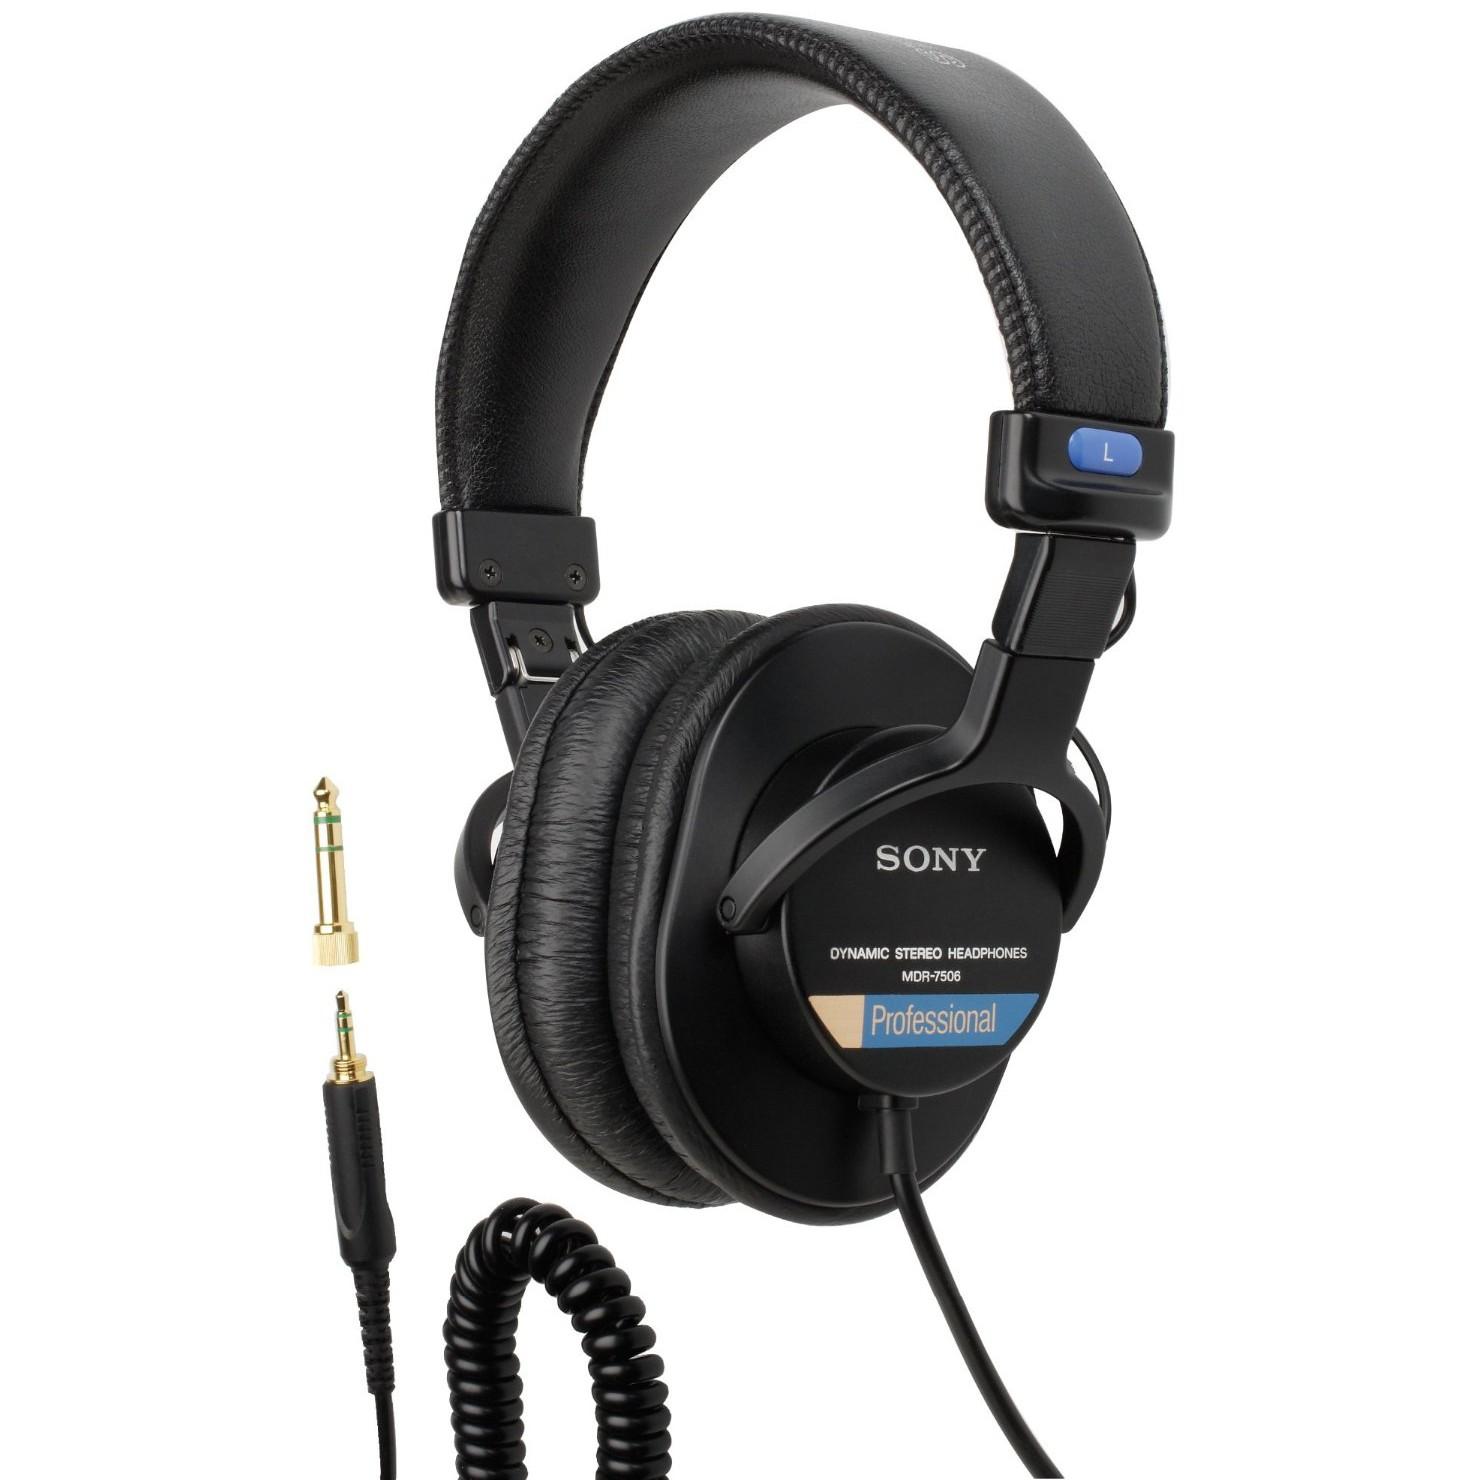 Item SONY MDR-7506 STUDIO HEADPHONES-CLOSED, NEW